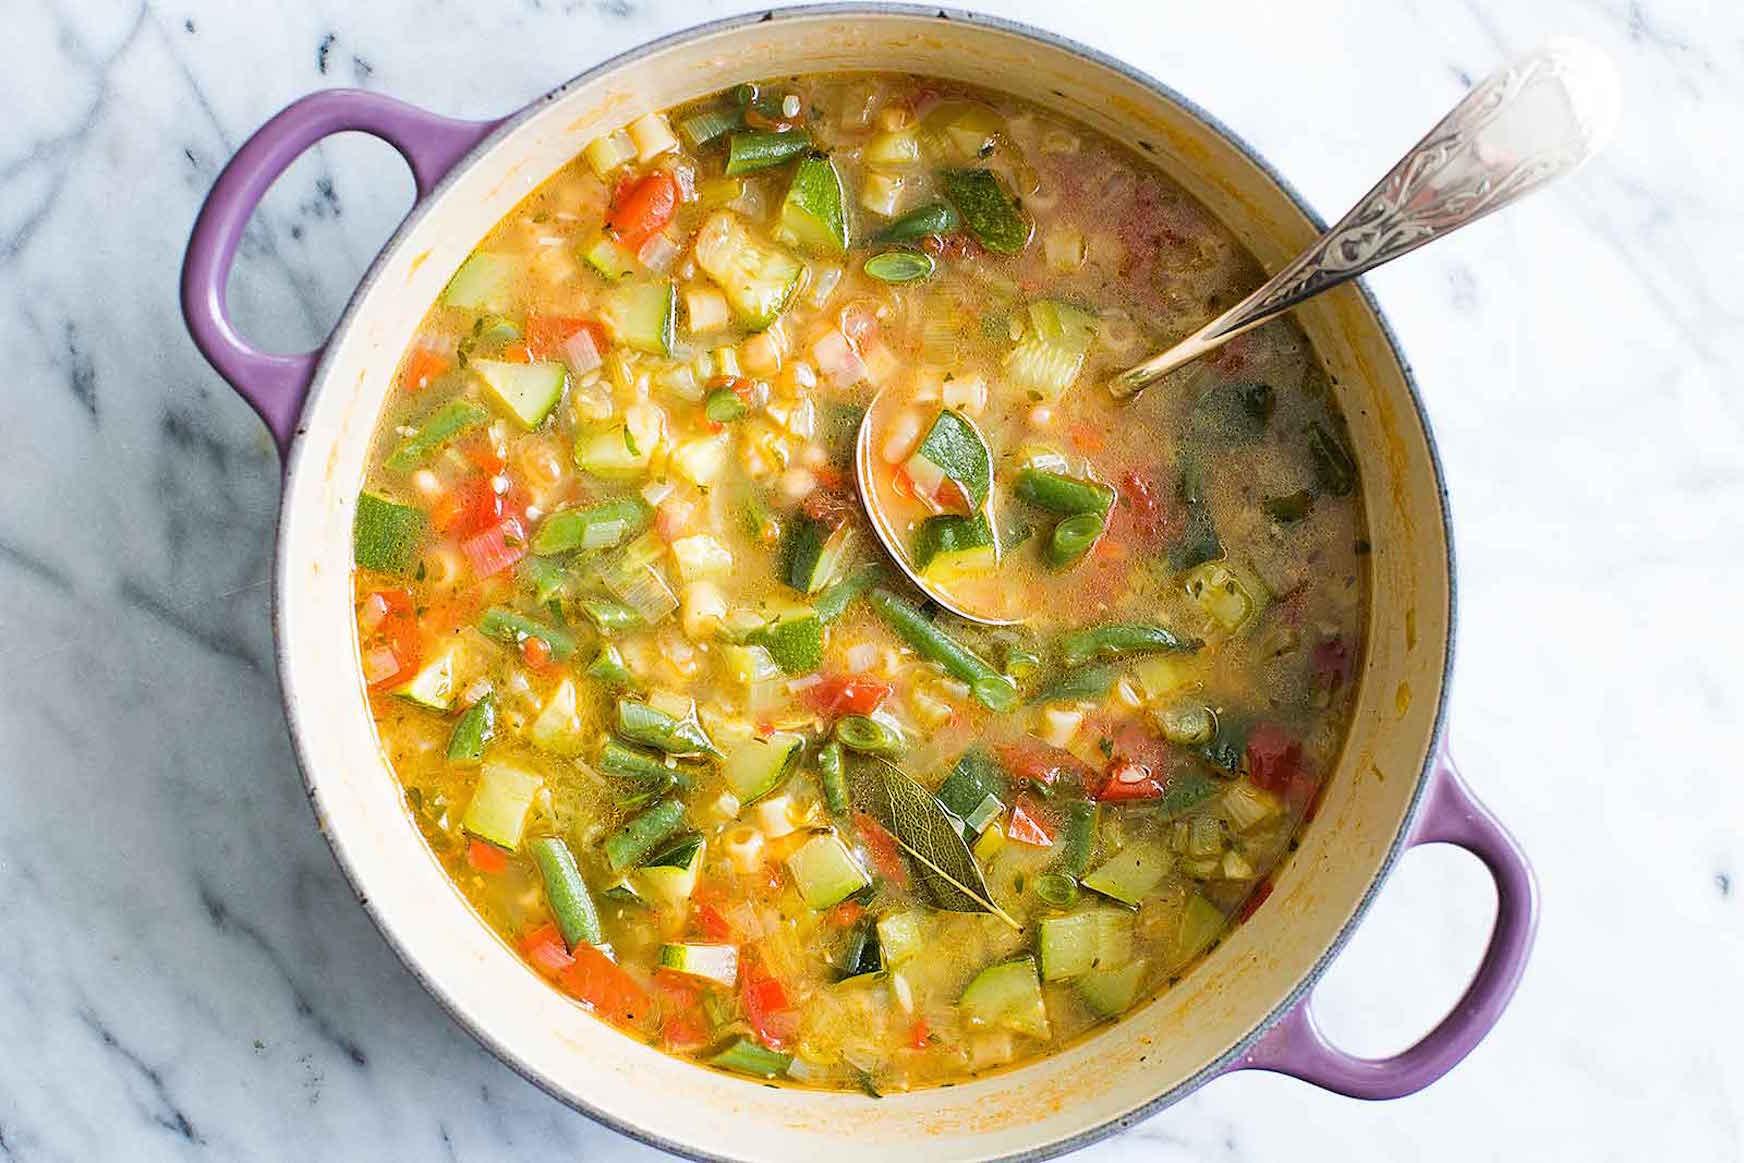 B Amp M Lifestyle Best Of Pinterest Autumn Soup Recipes Minestrone Soup